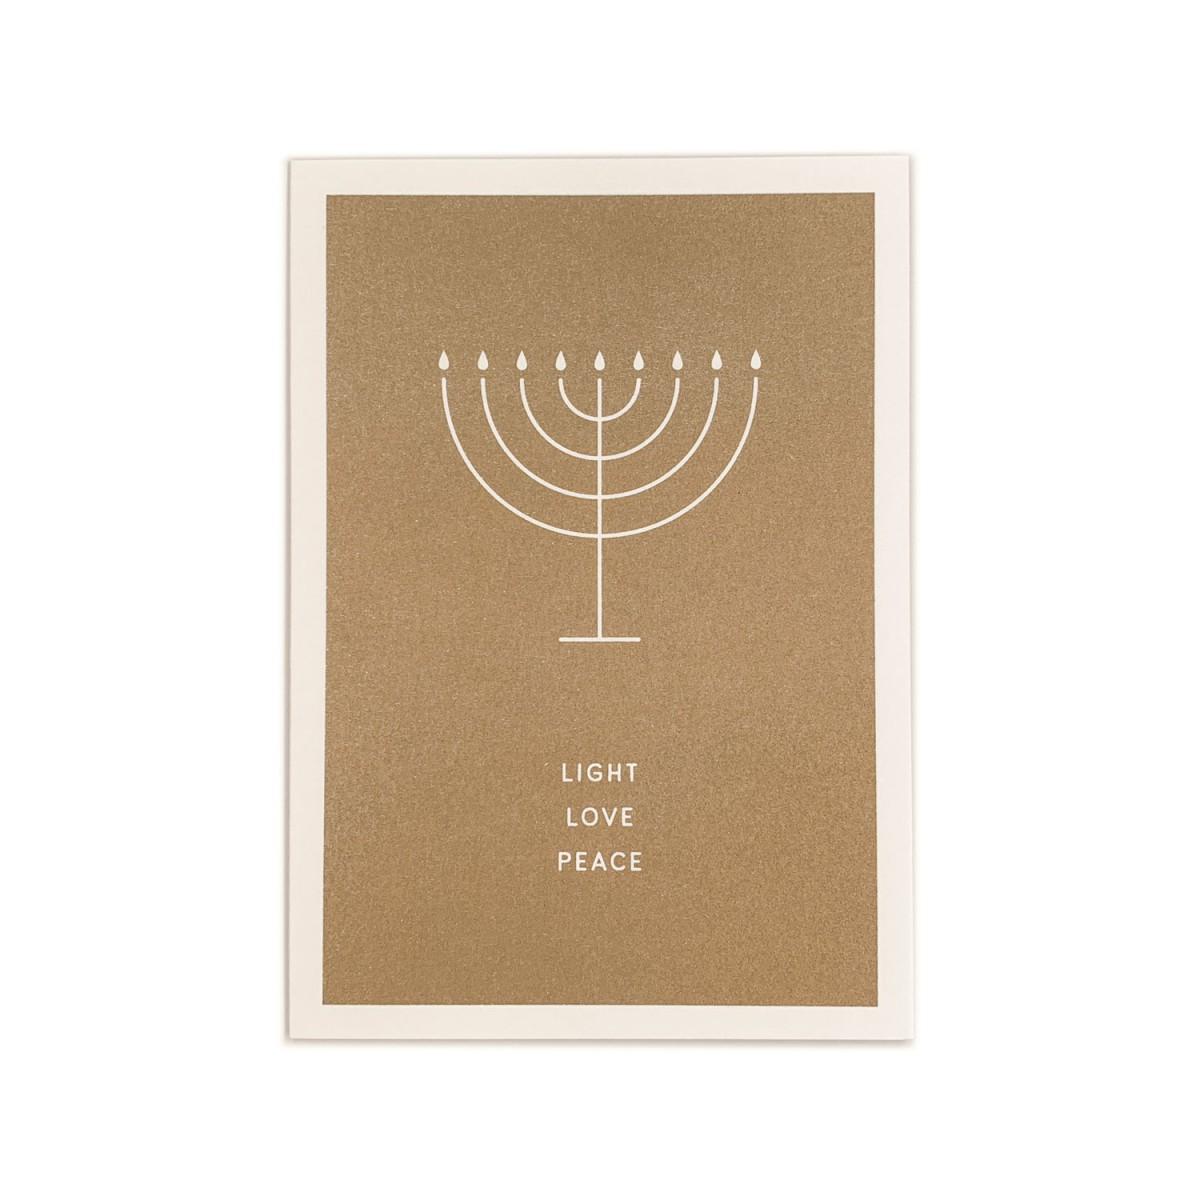 Feingeladen // SIMPLY DIVINE // Hanukkah »Light Love Peace« (GD), RISO-Klappkarte, A6